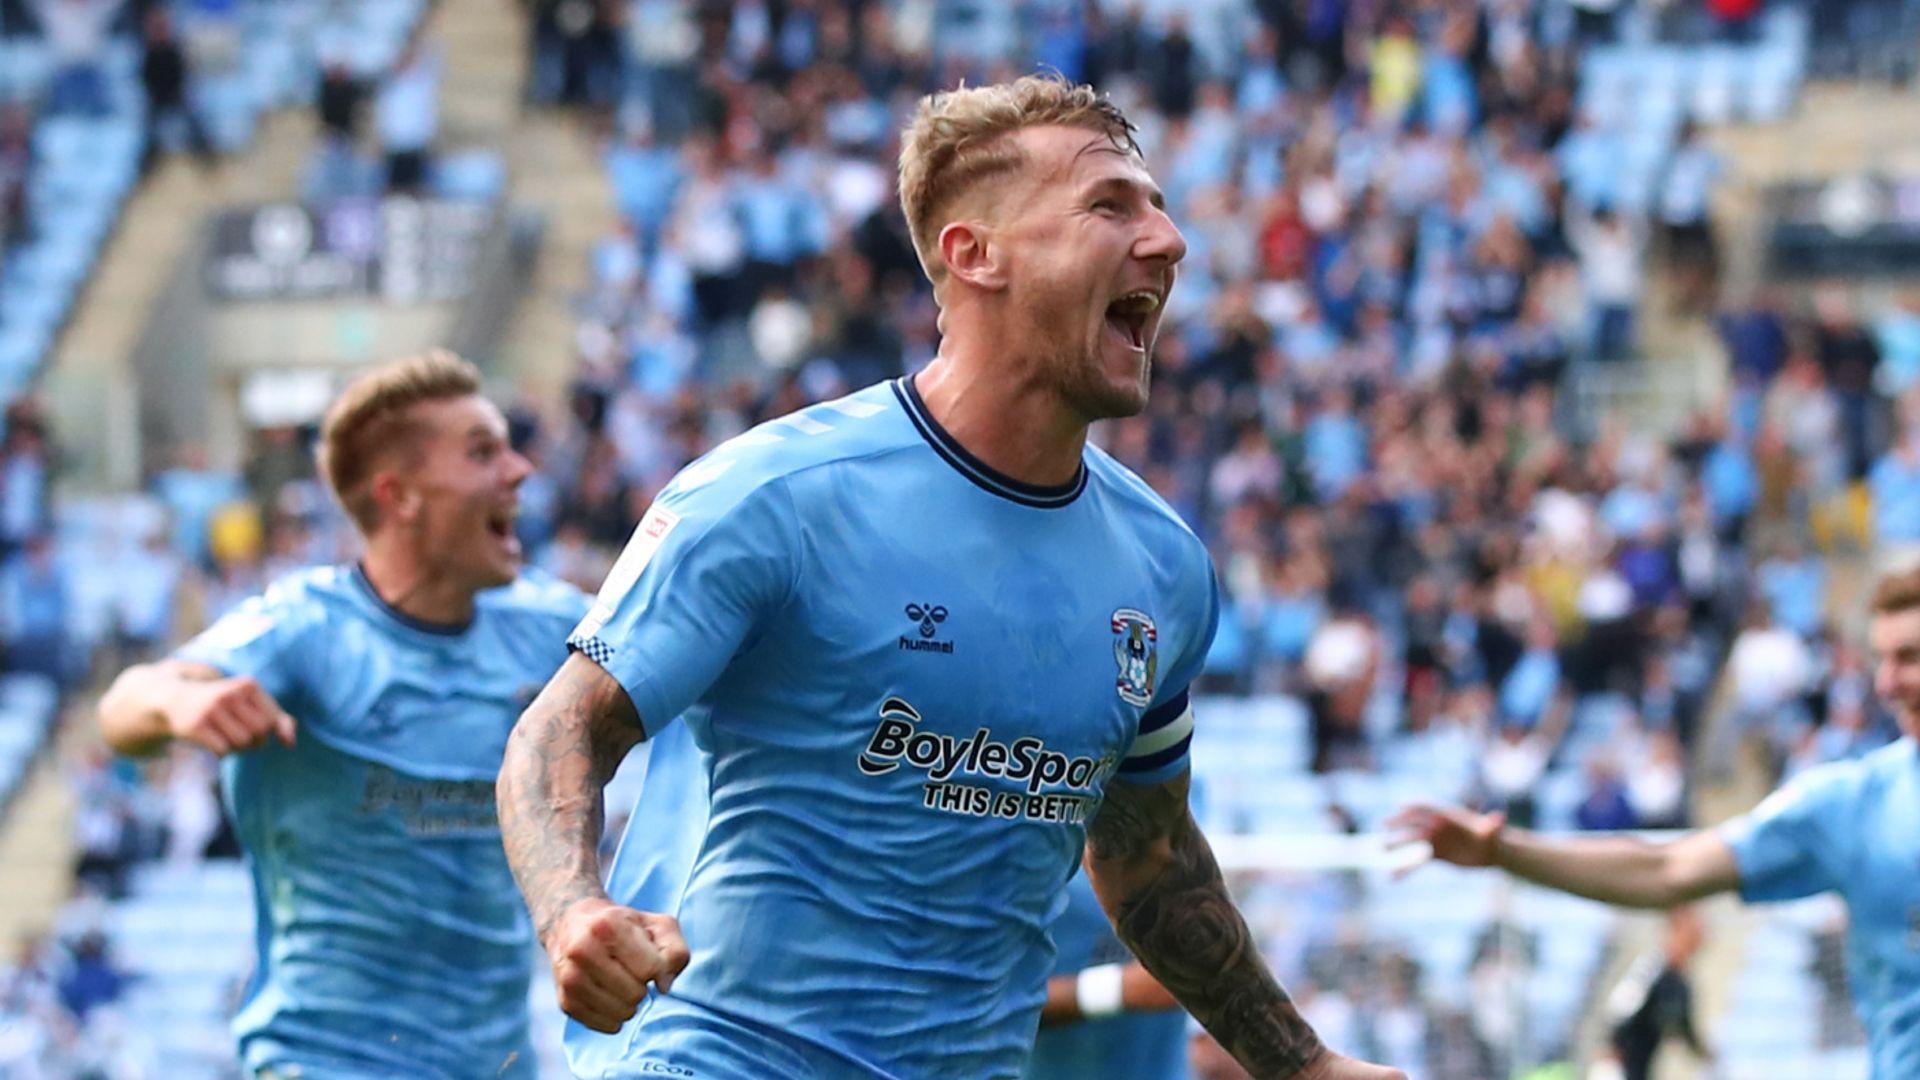 McFadzean seals fairytale Coventry homecoming